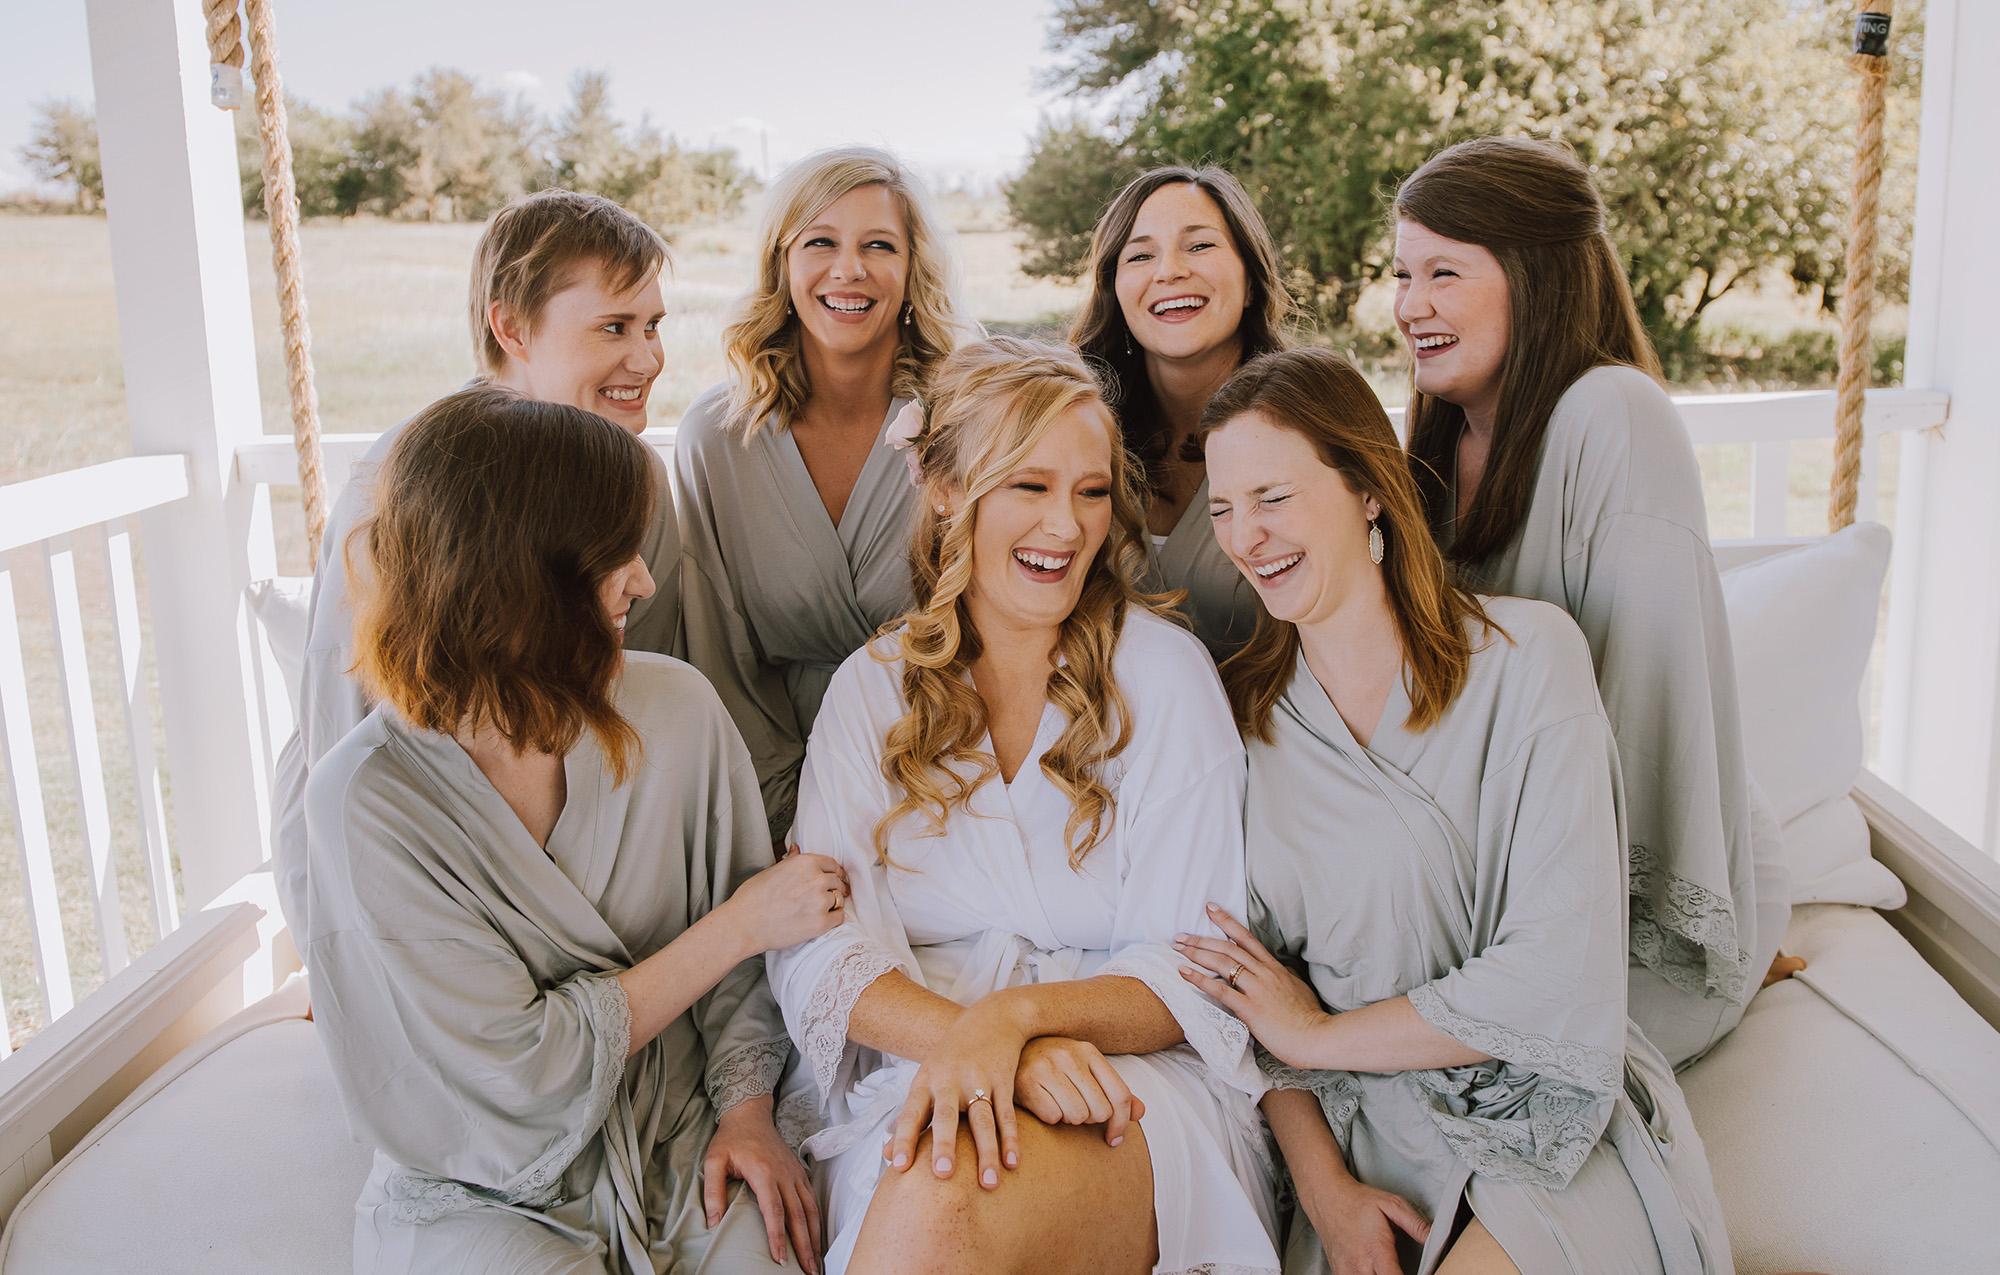 Grey Bridesmaid Robes - The Grand Ivory Wedding - Leonard, Texas Wedding Venue